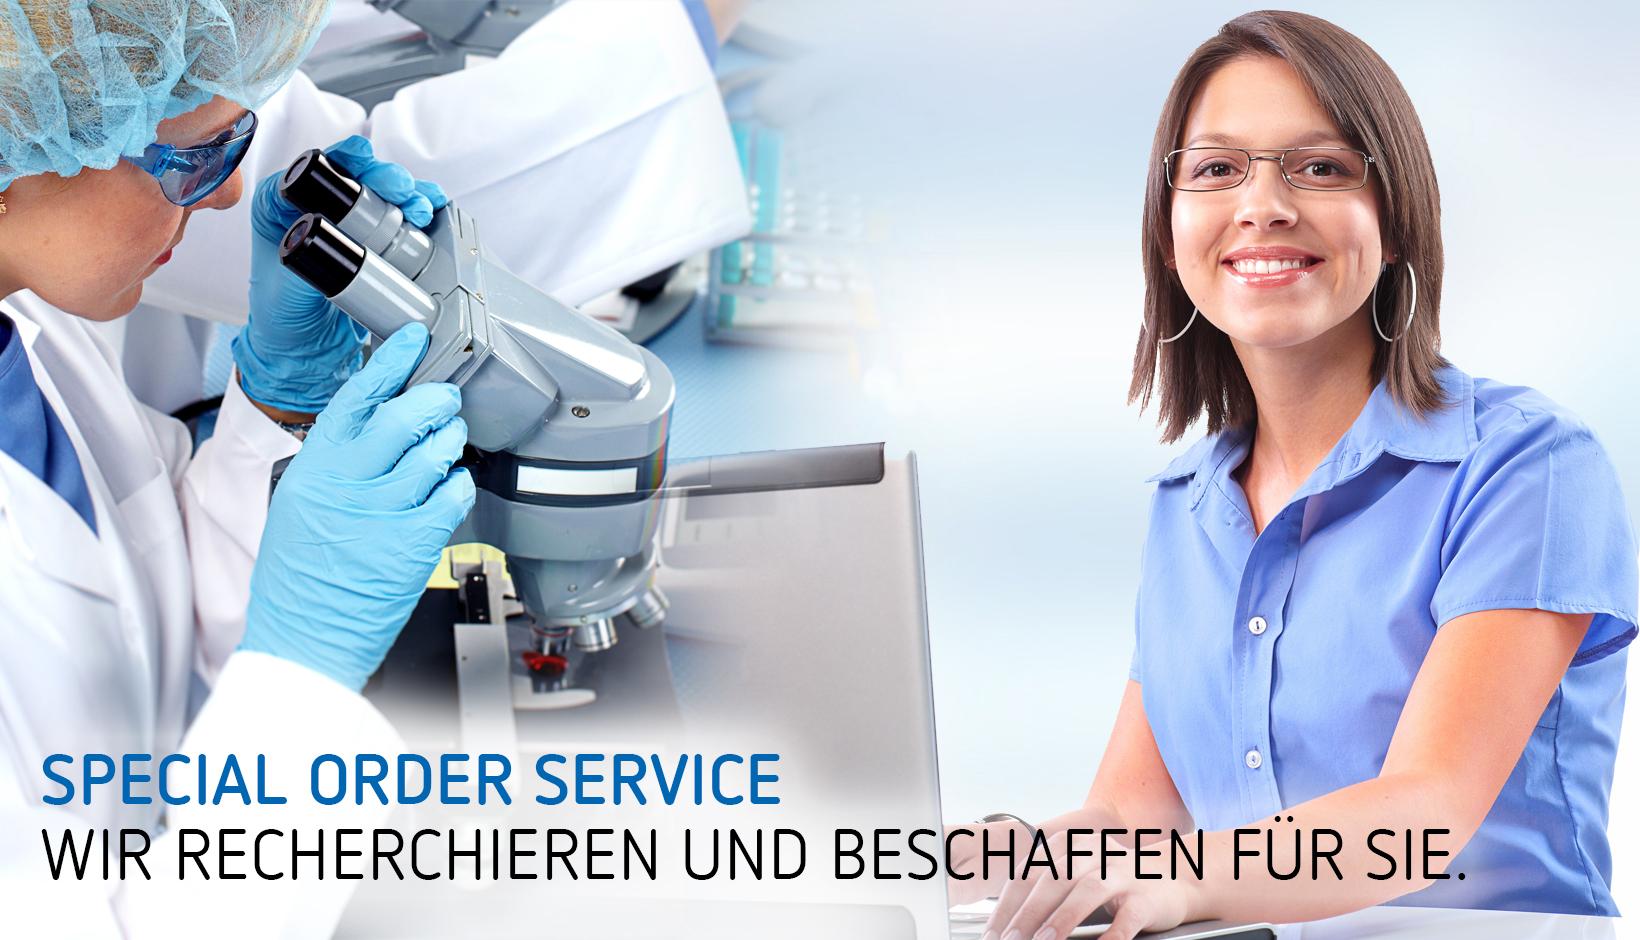 Special Order Service